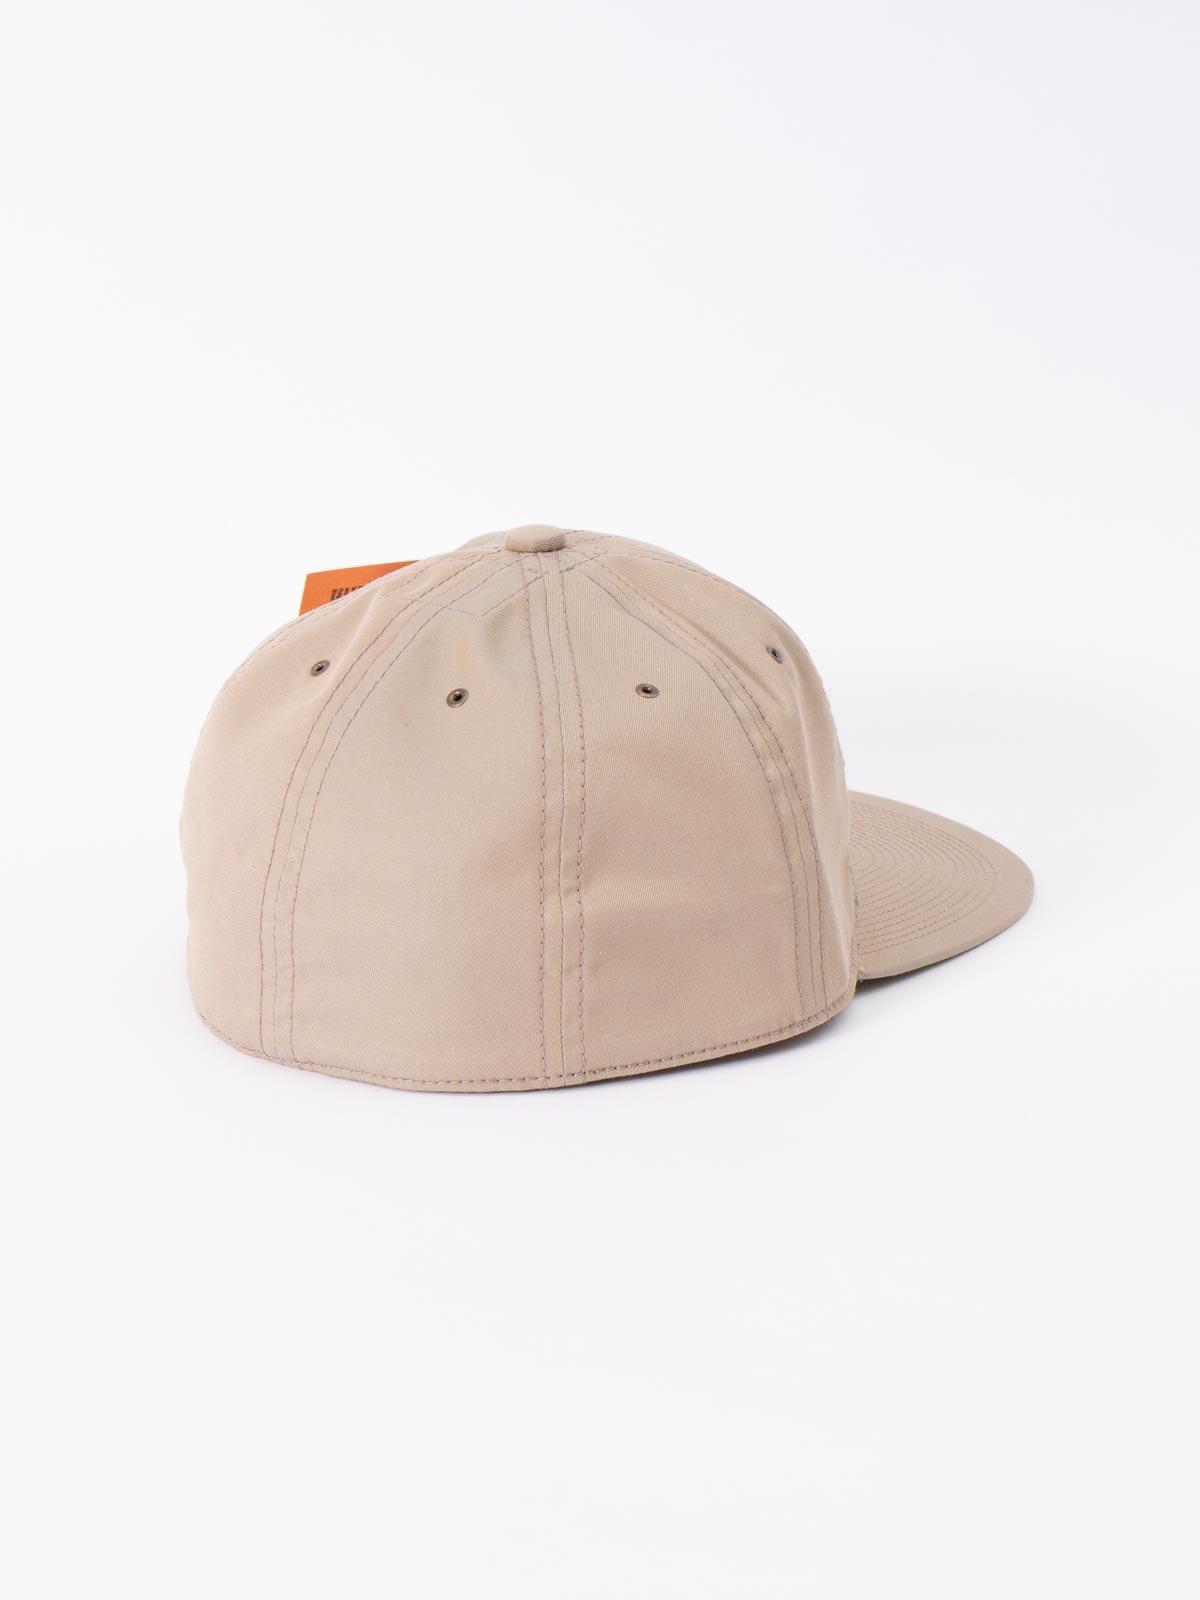 BEIGE COTTON CAP - Image 2